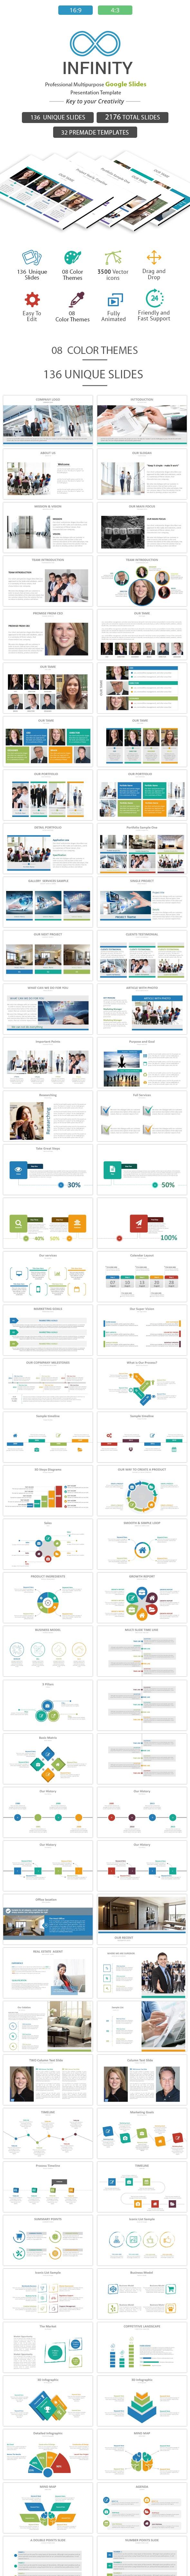 Infinity Google Slides  Presentation Template - Google Slides Presentation Templates